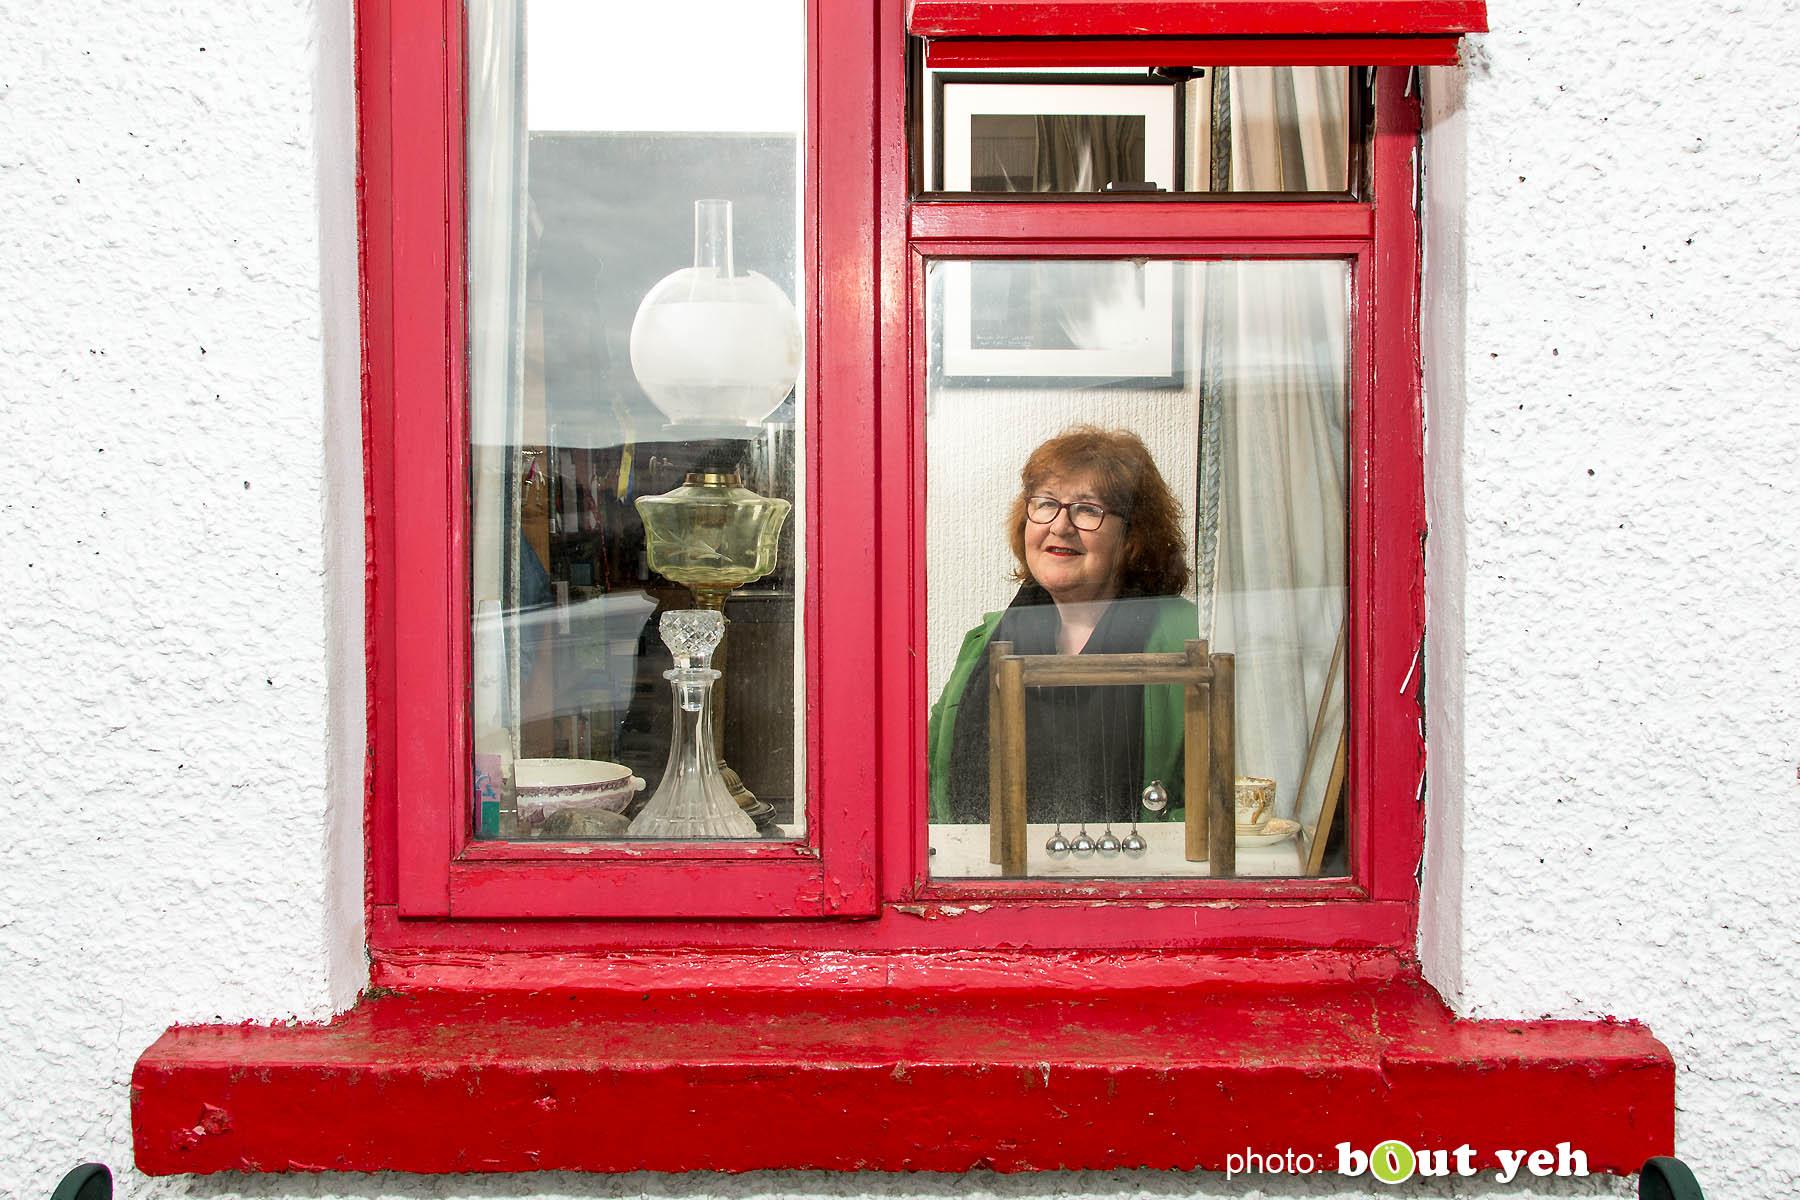 Liz Weir, Ballyeamon Barn Hostel, Glenariff, Northern Ireland - photo 1031.